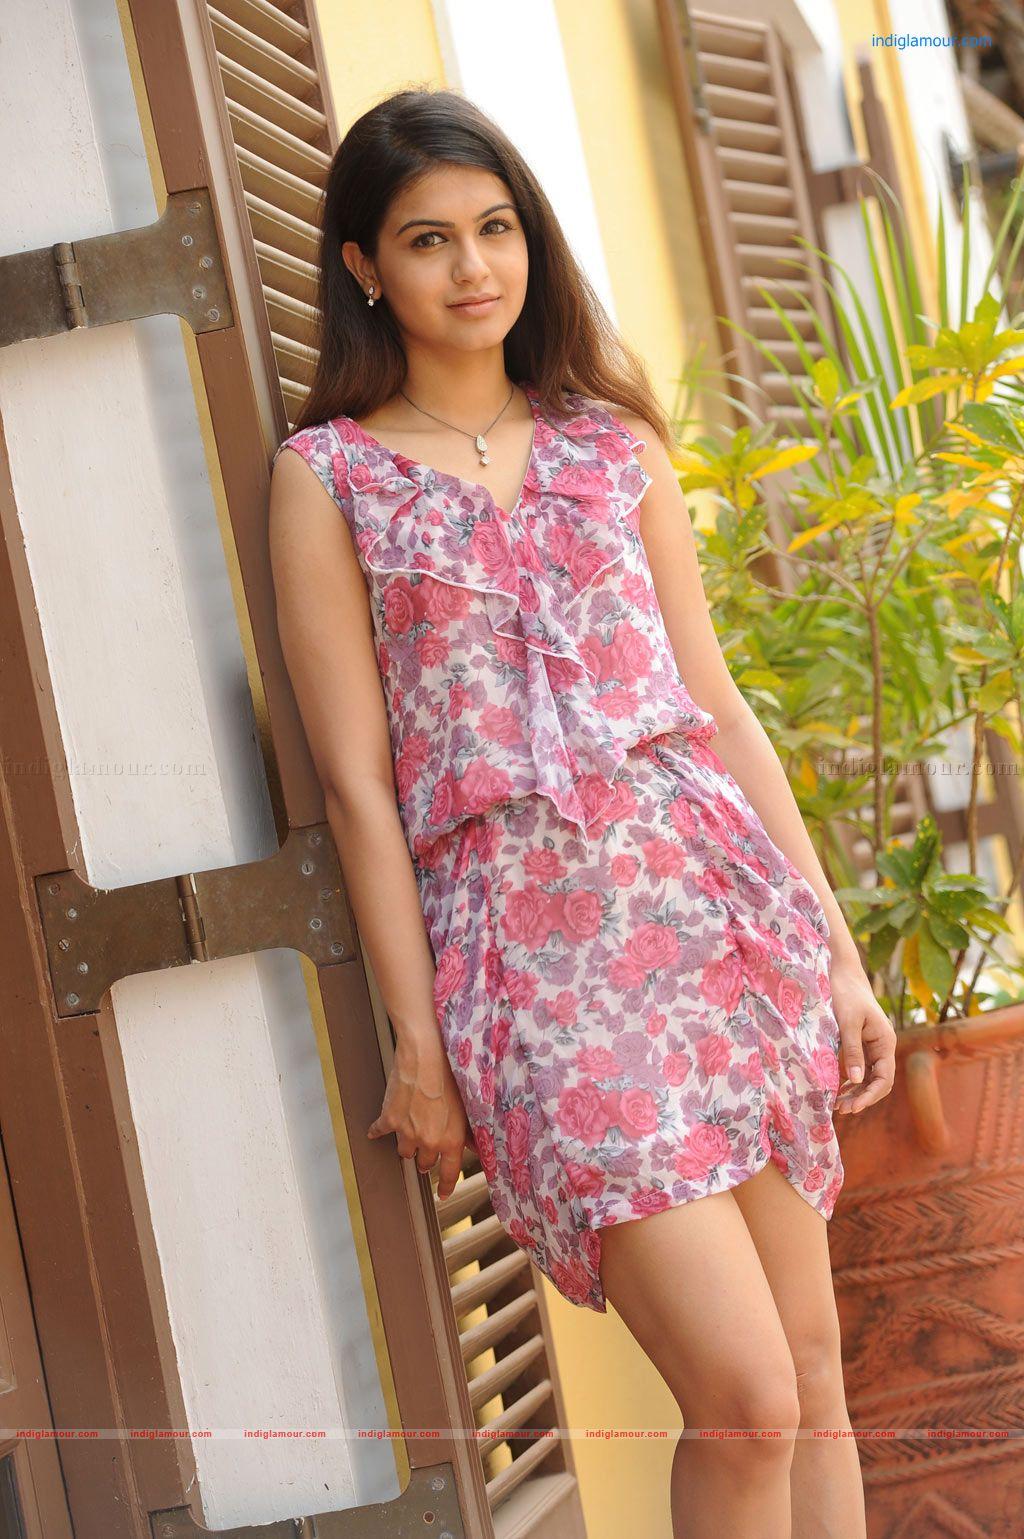 Samar Actress Photos Stills Images Pictures and Hot